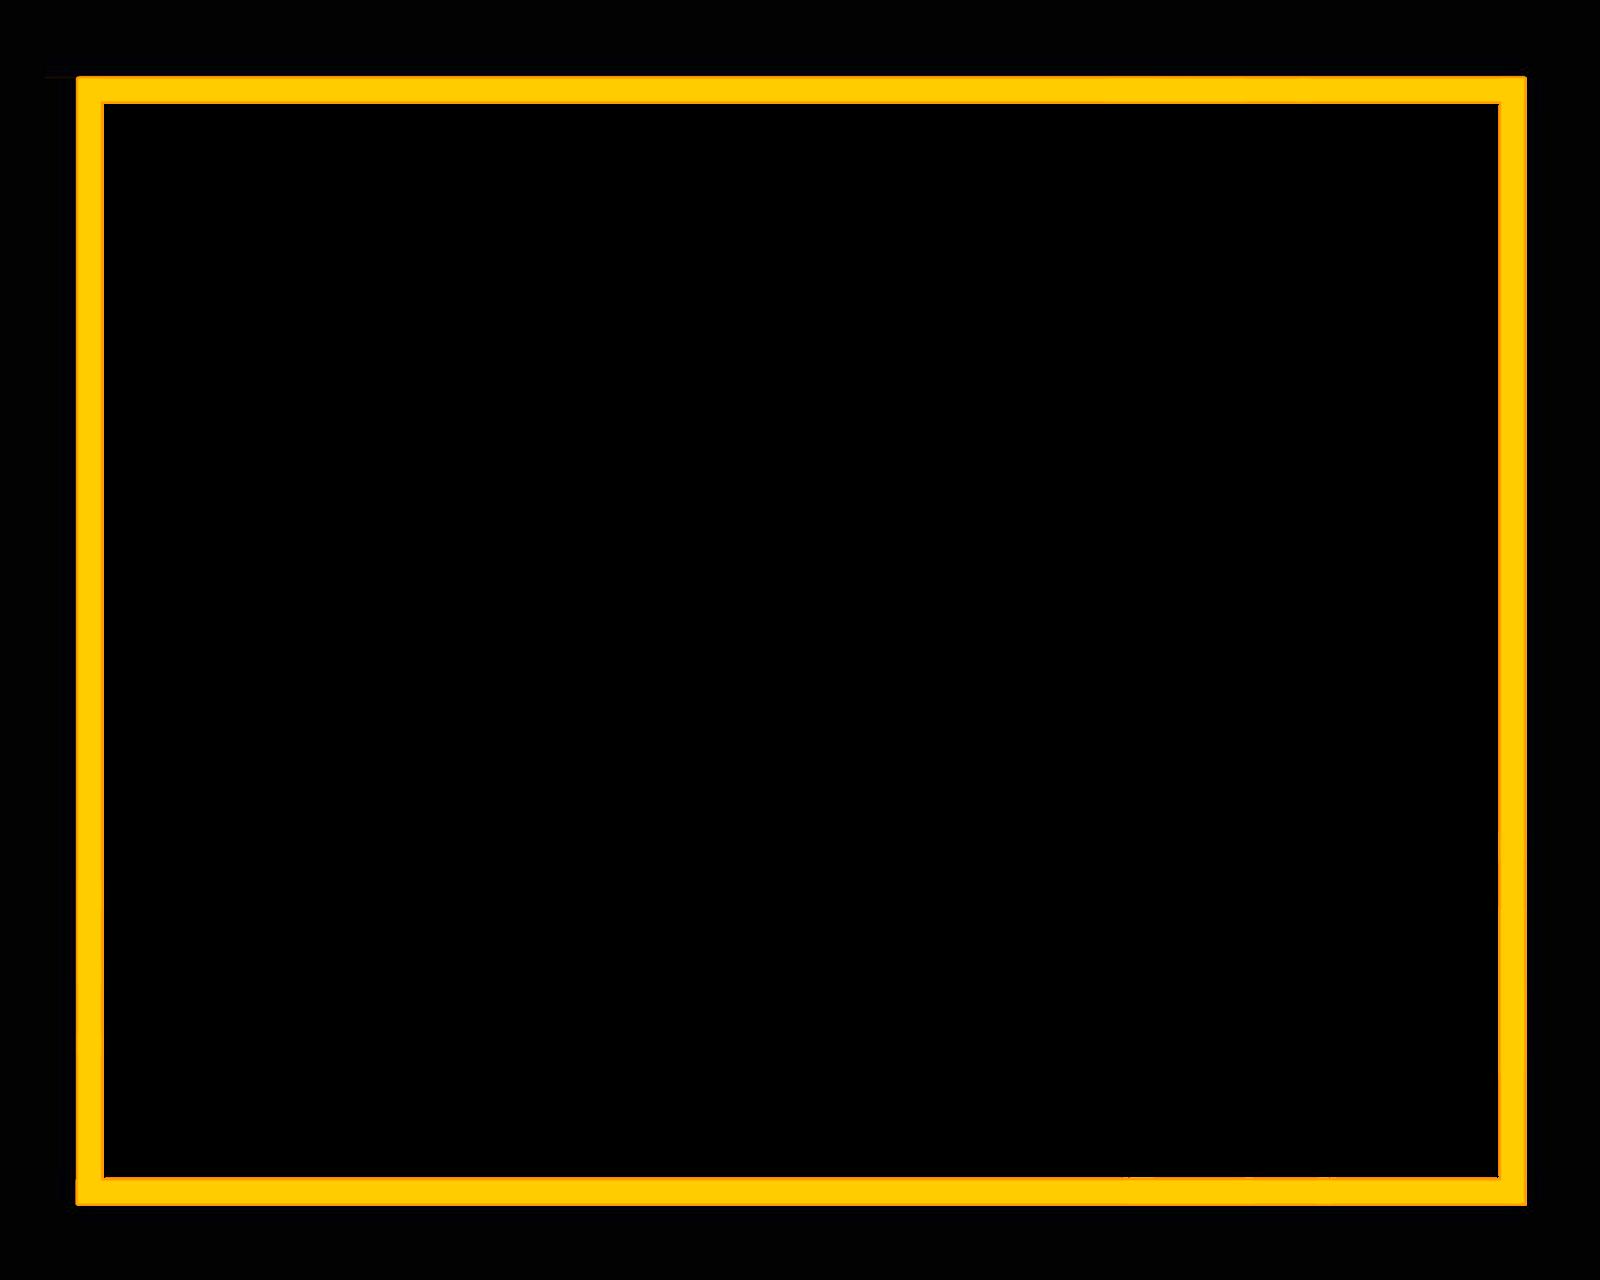 Download Free Yellow Border Frame Transparent ICON favicon ...